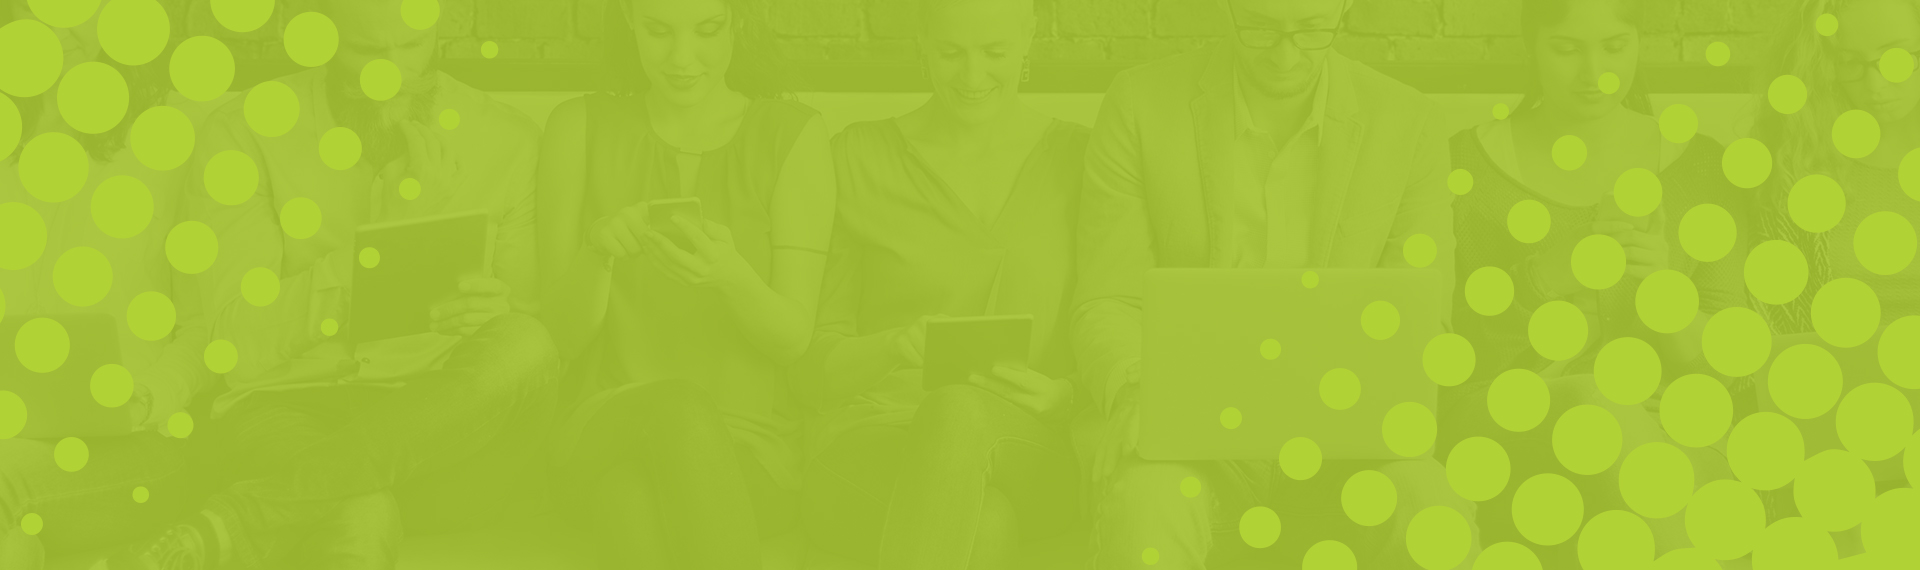 Brandall Agency Social Media Web Page